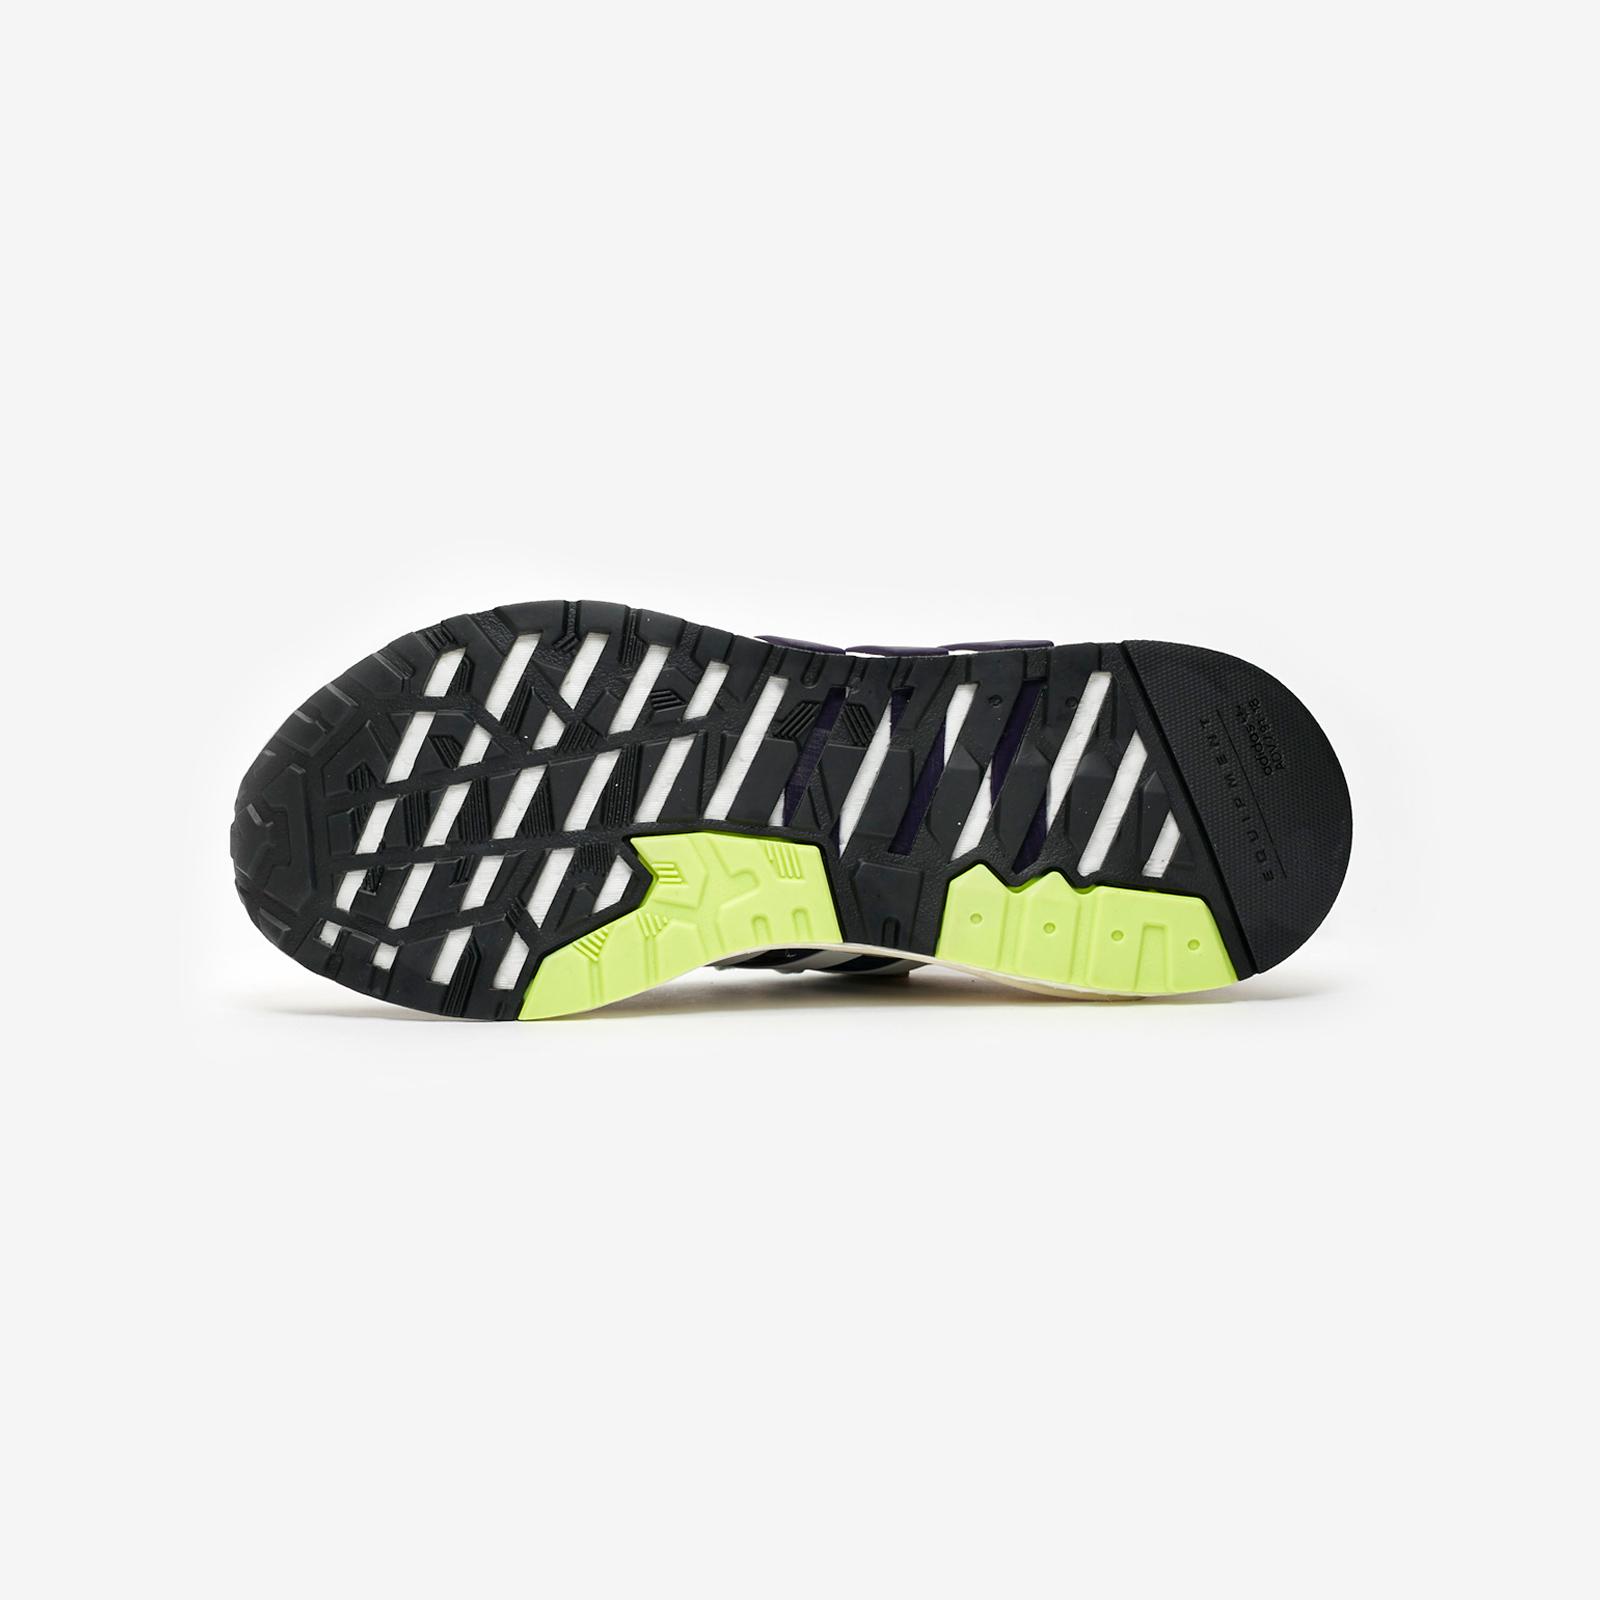 adidas Eqt Support 91/18 - Cm8409